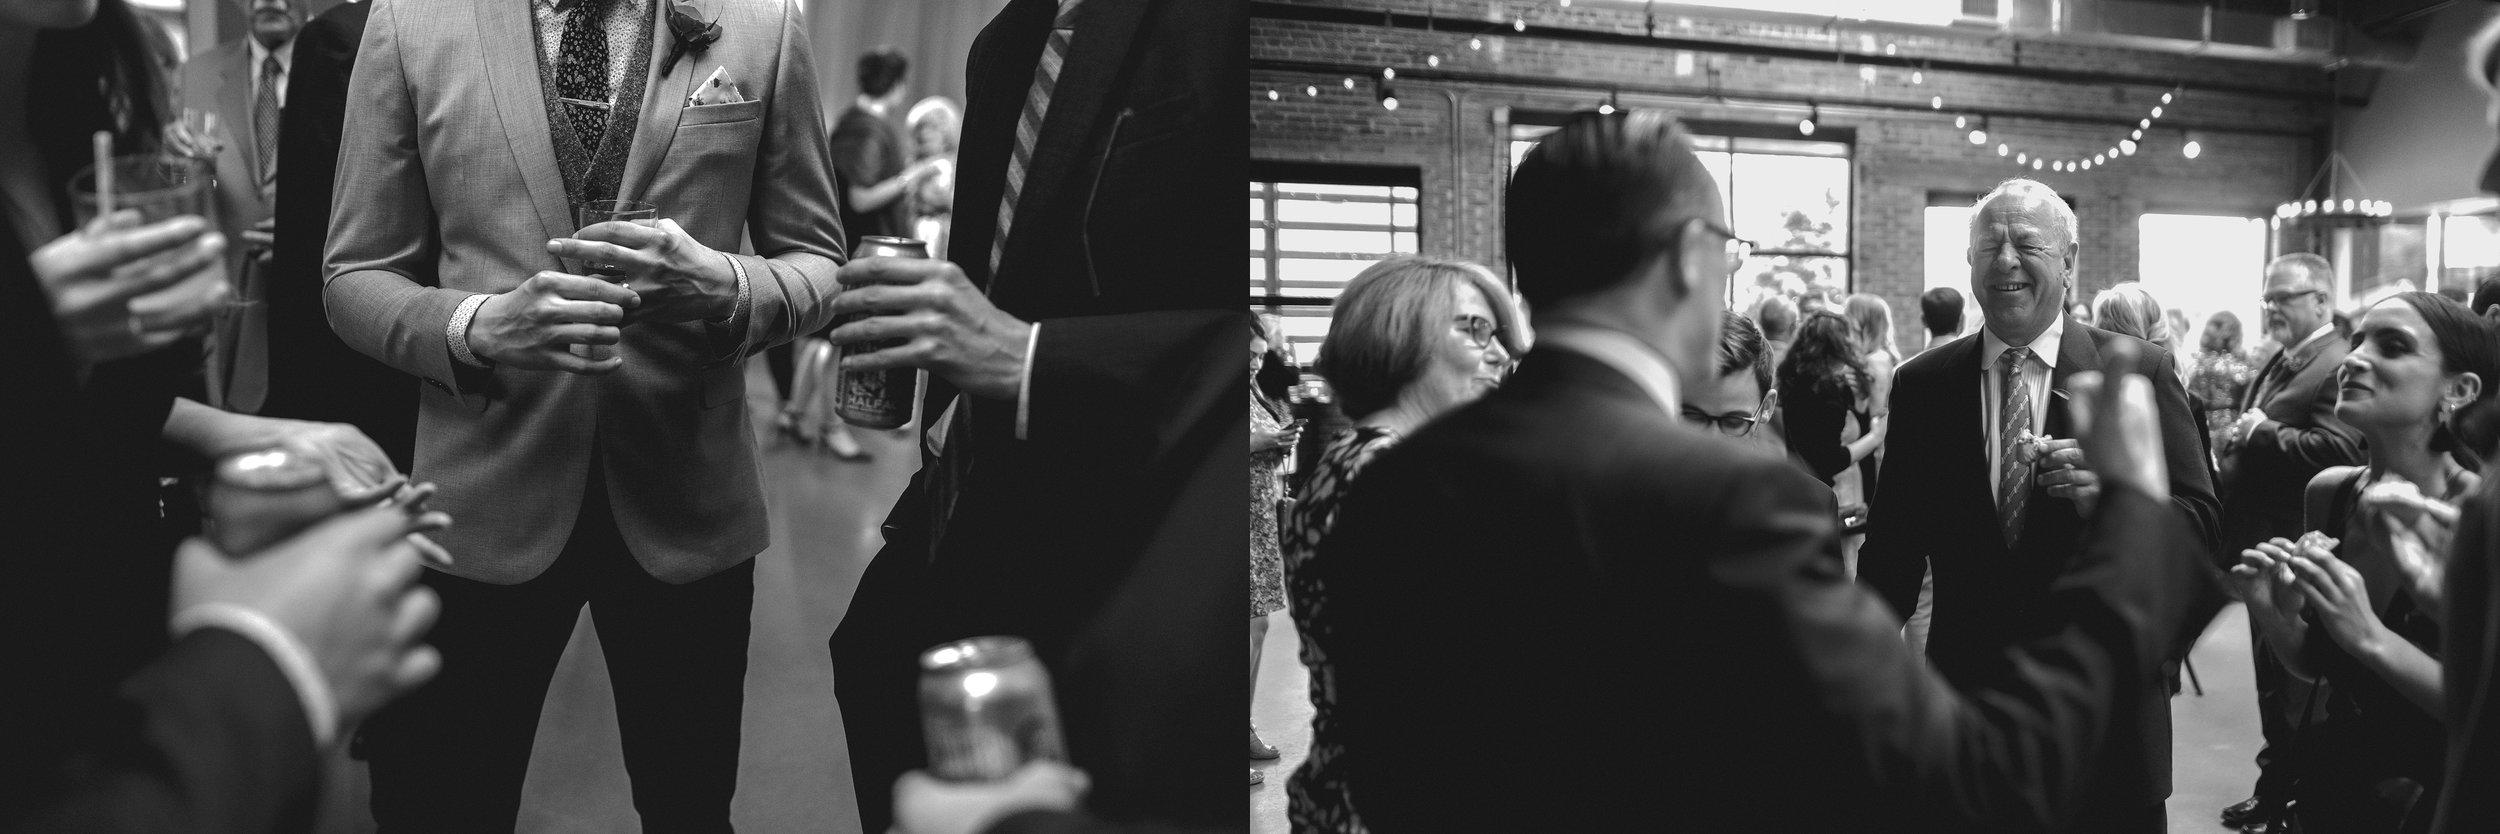 chicago_wedding_photography_zoe_rain_30.jpg